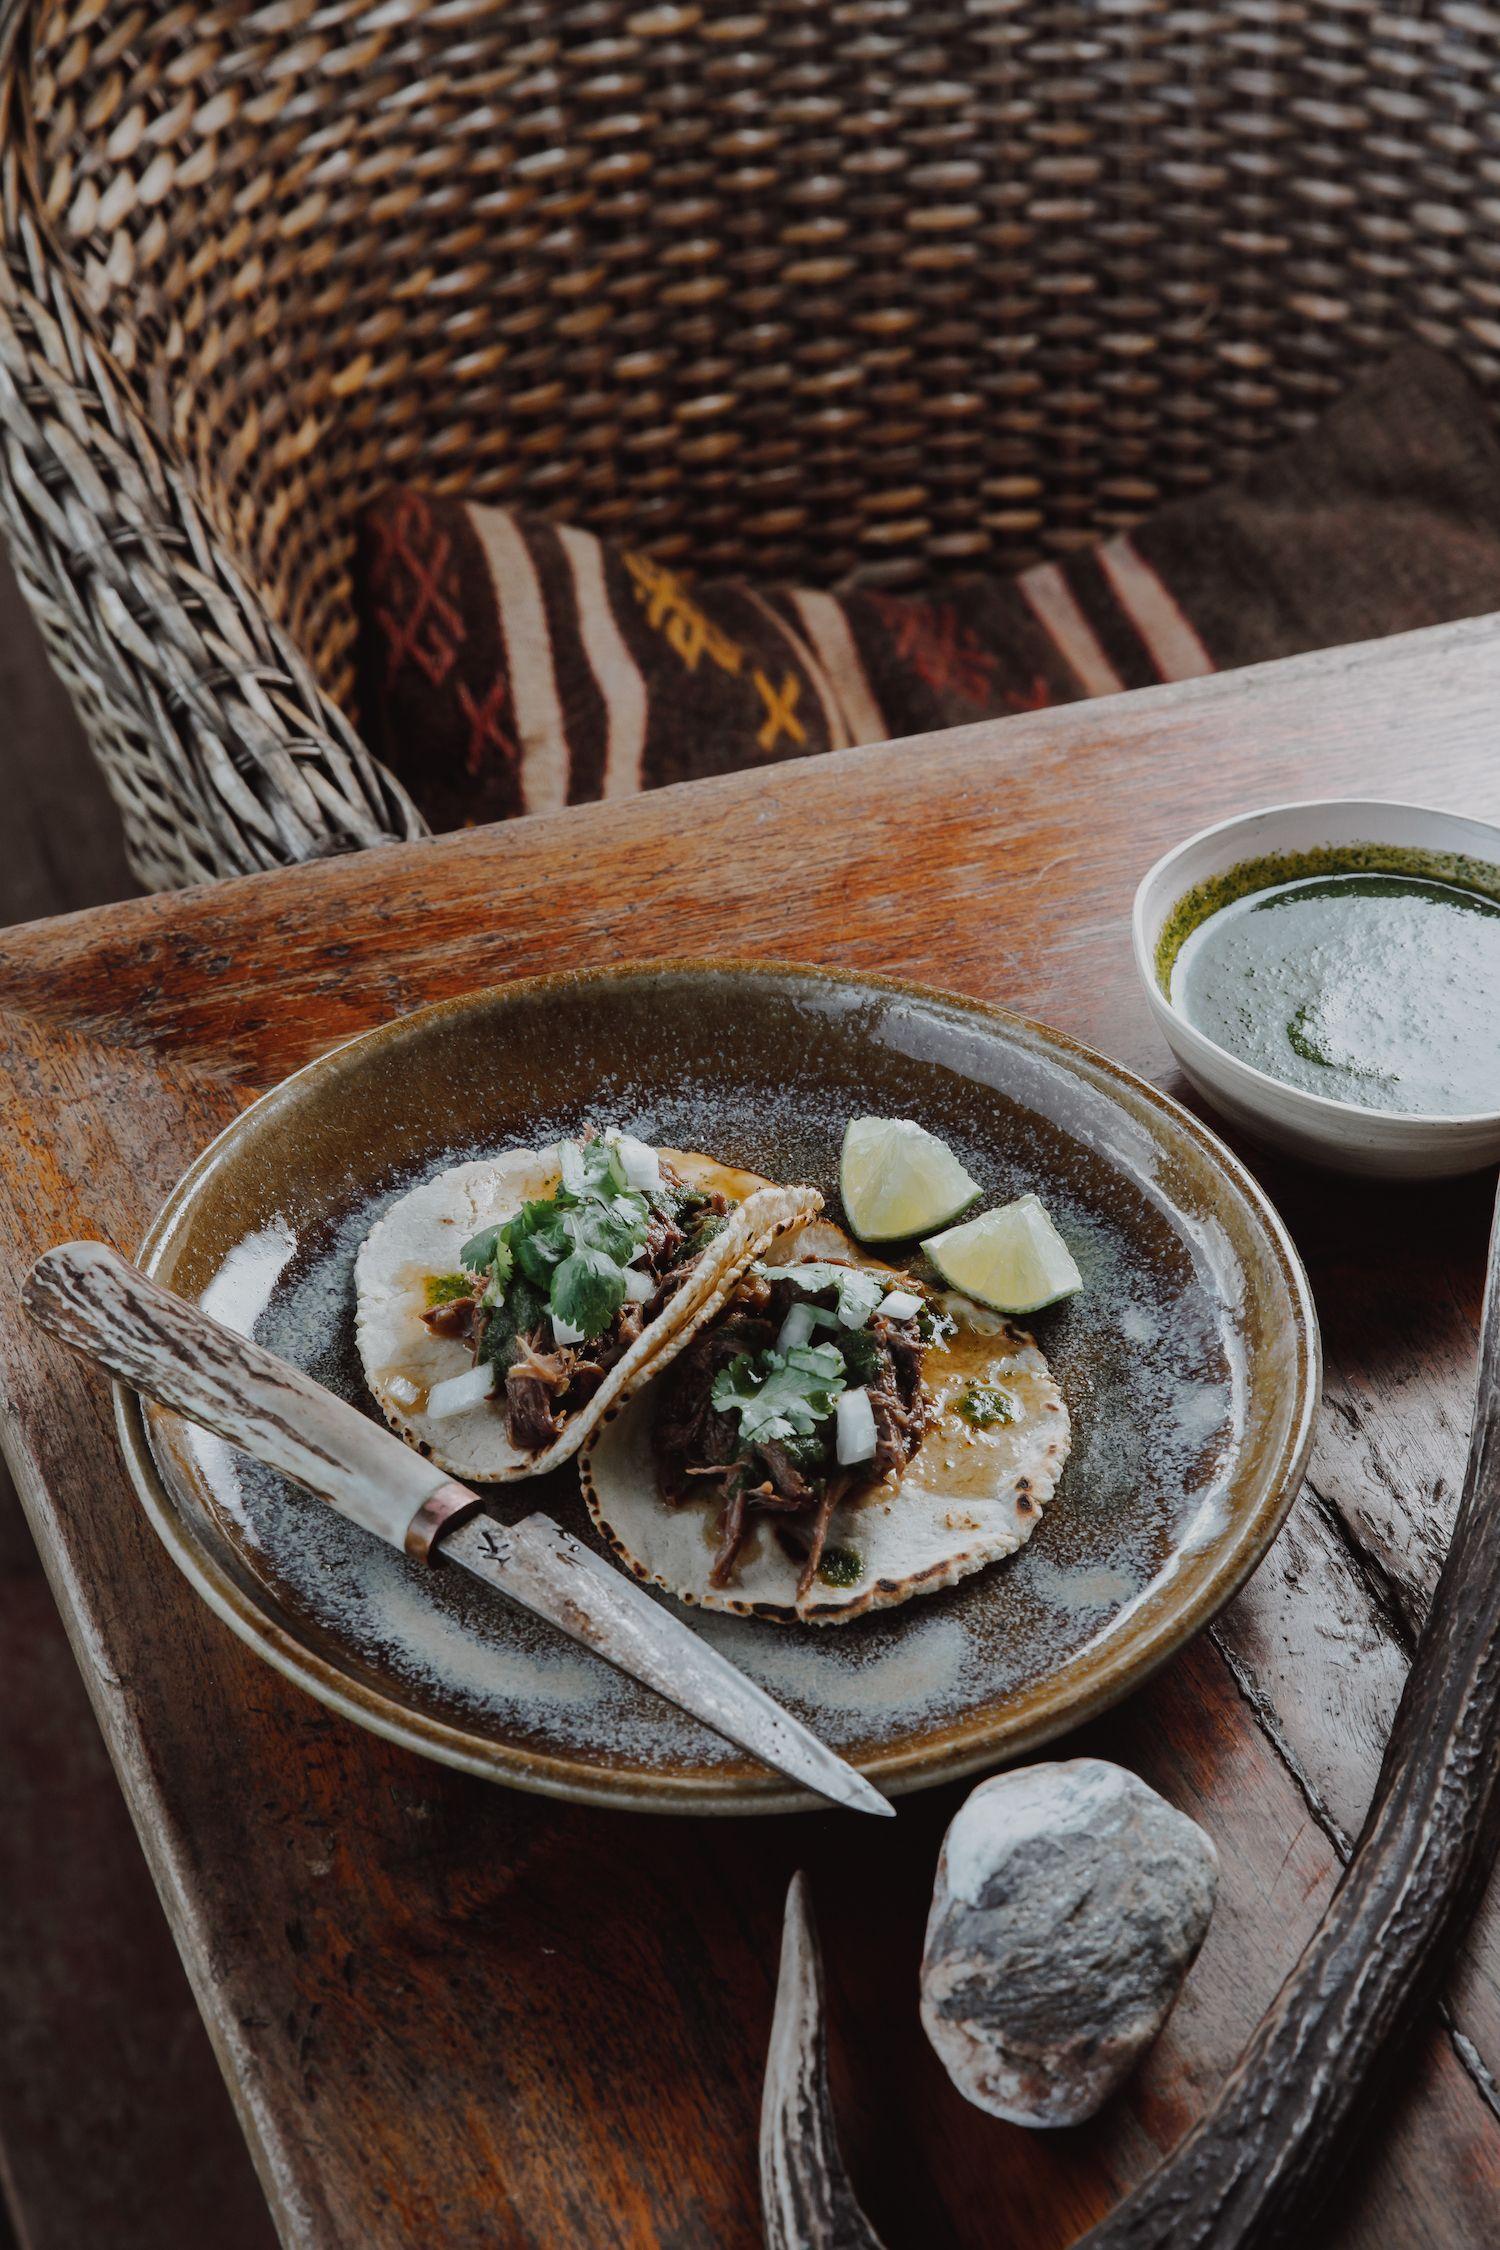 Venison neck tacos served on a plate